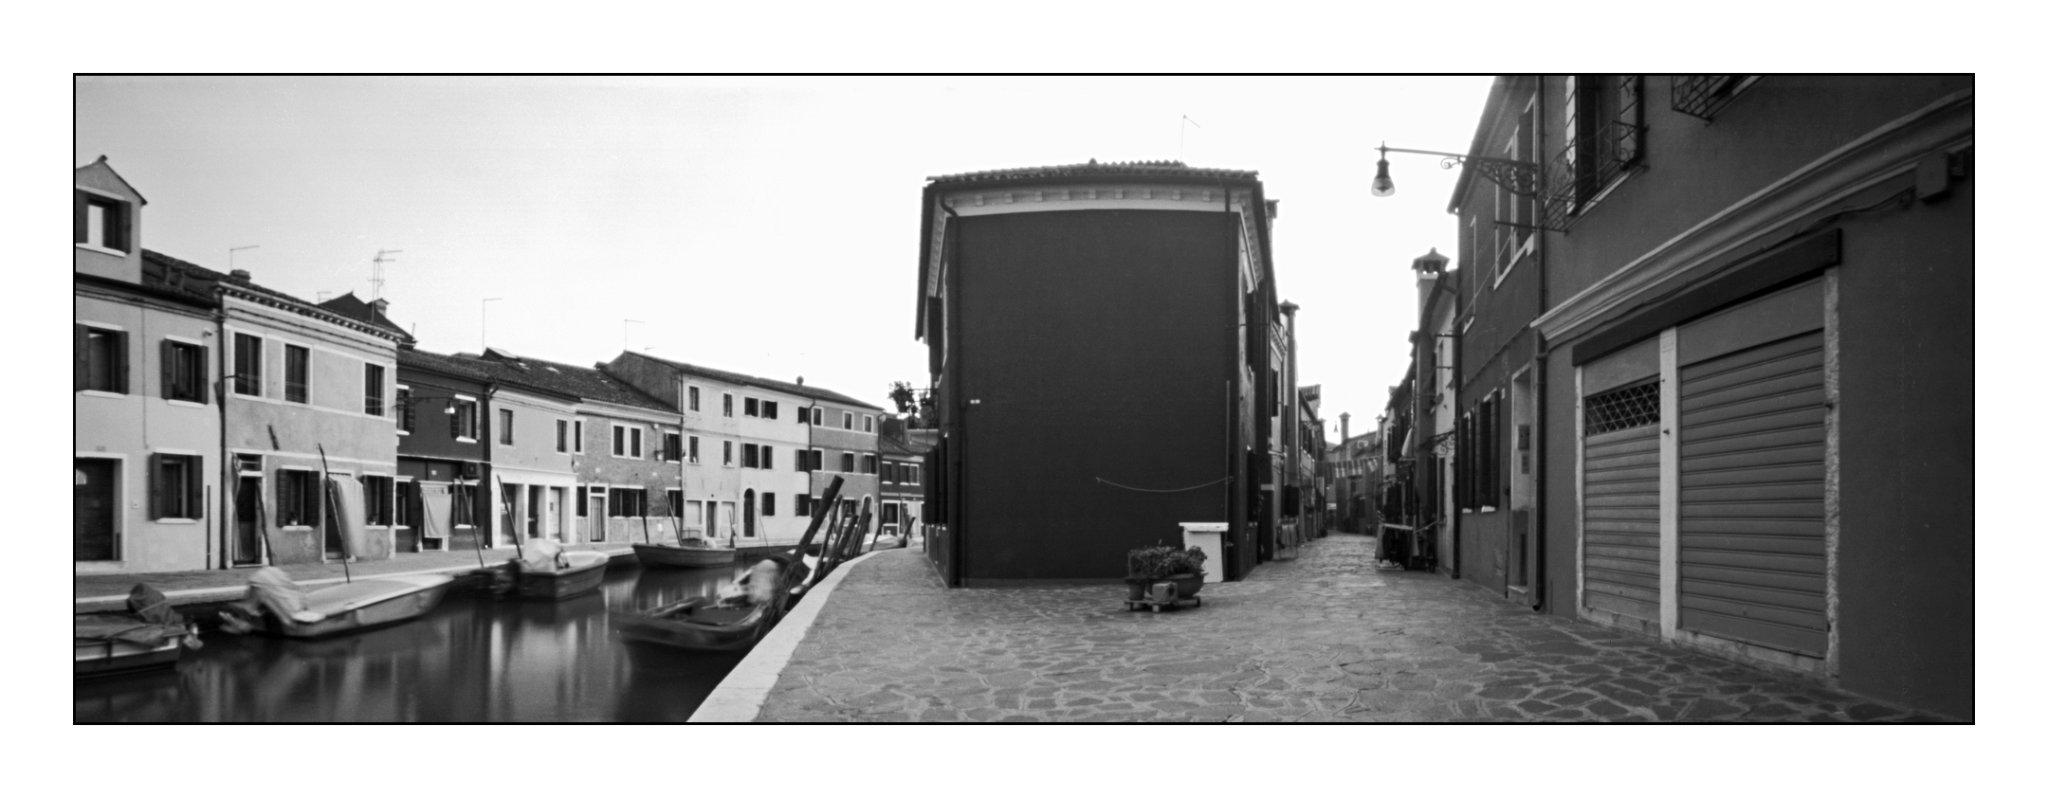 Burano, Lochkamera 16x7 analog: Venedig, Fotograf: Steffen Lohse